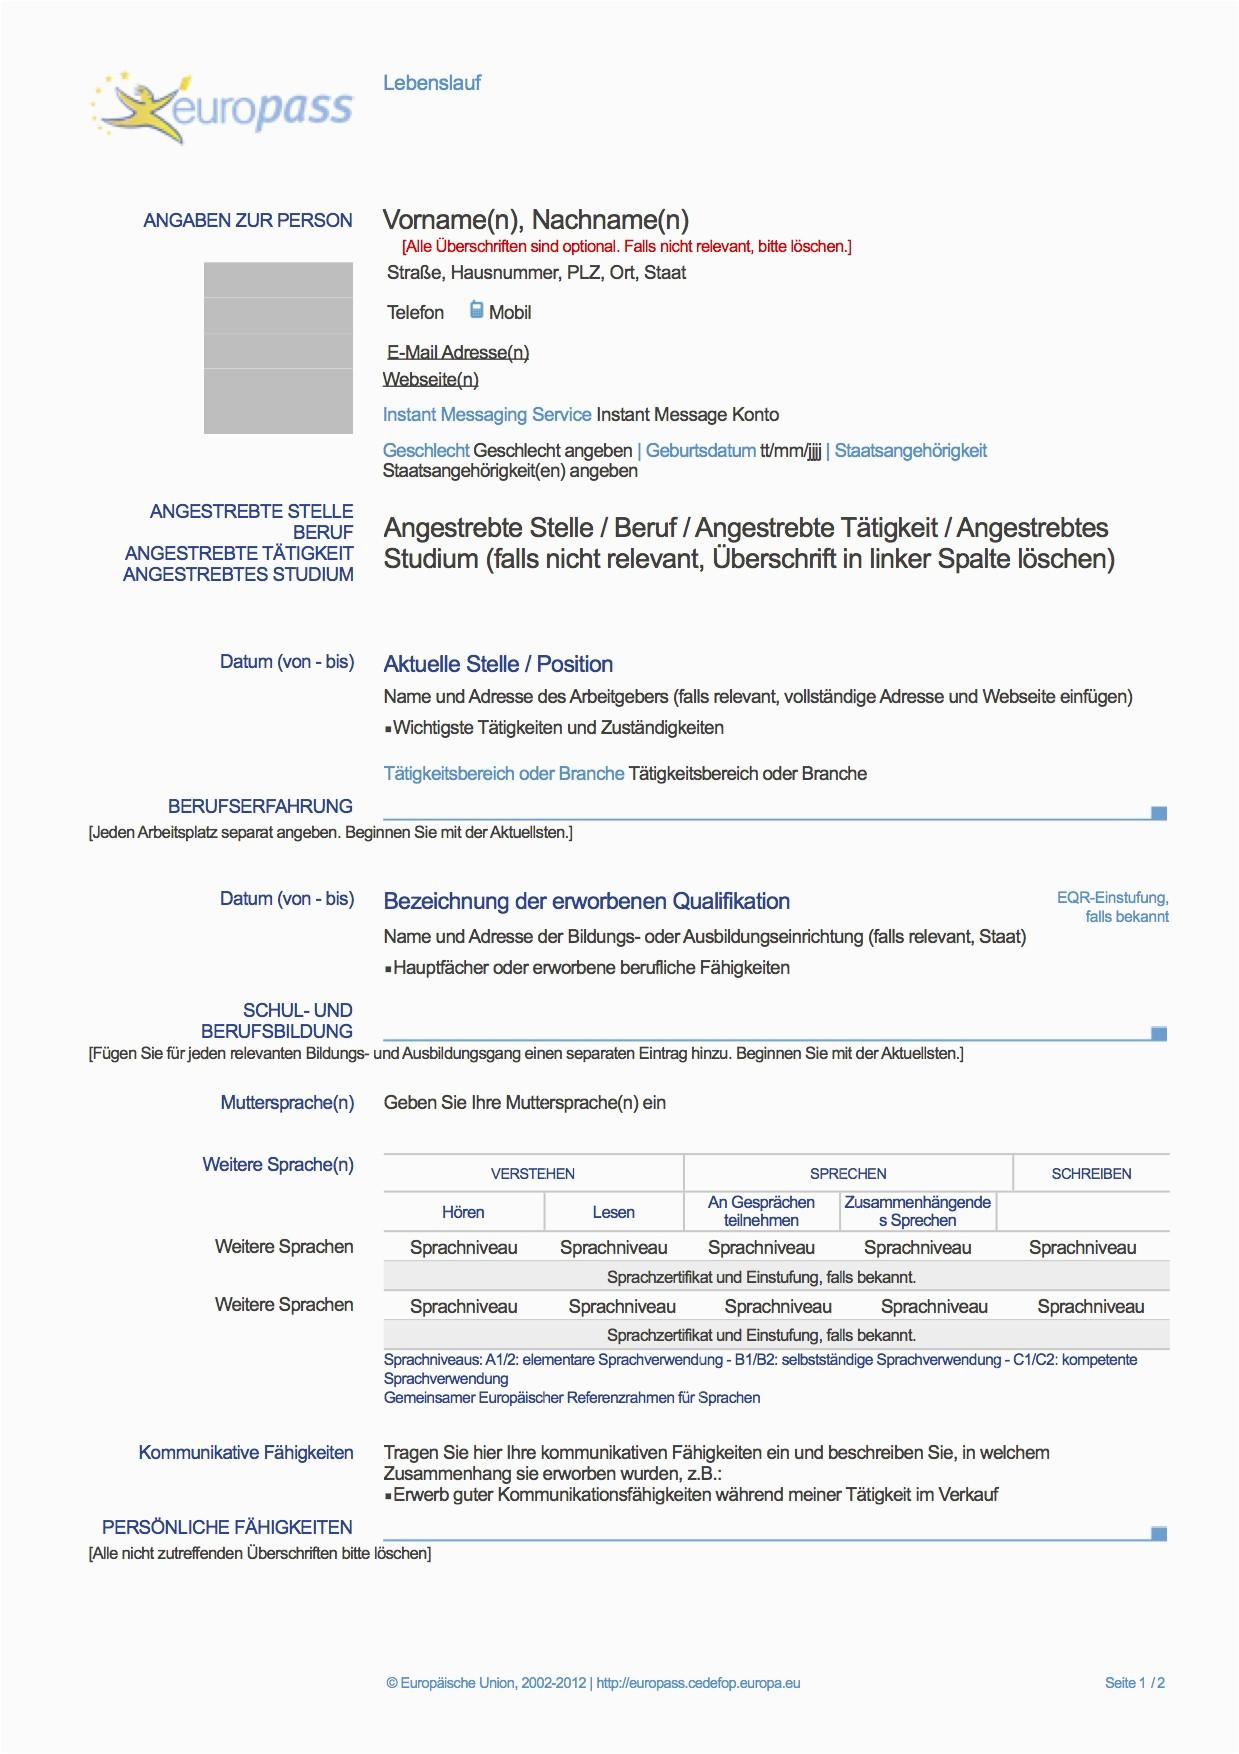 Europass Lebenslauf Deutsch Doc Europass Lebenslauf Deutsch Muster Lebenslauf